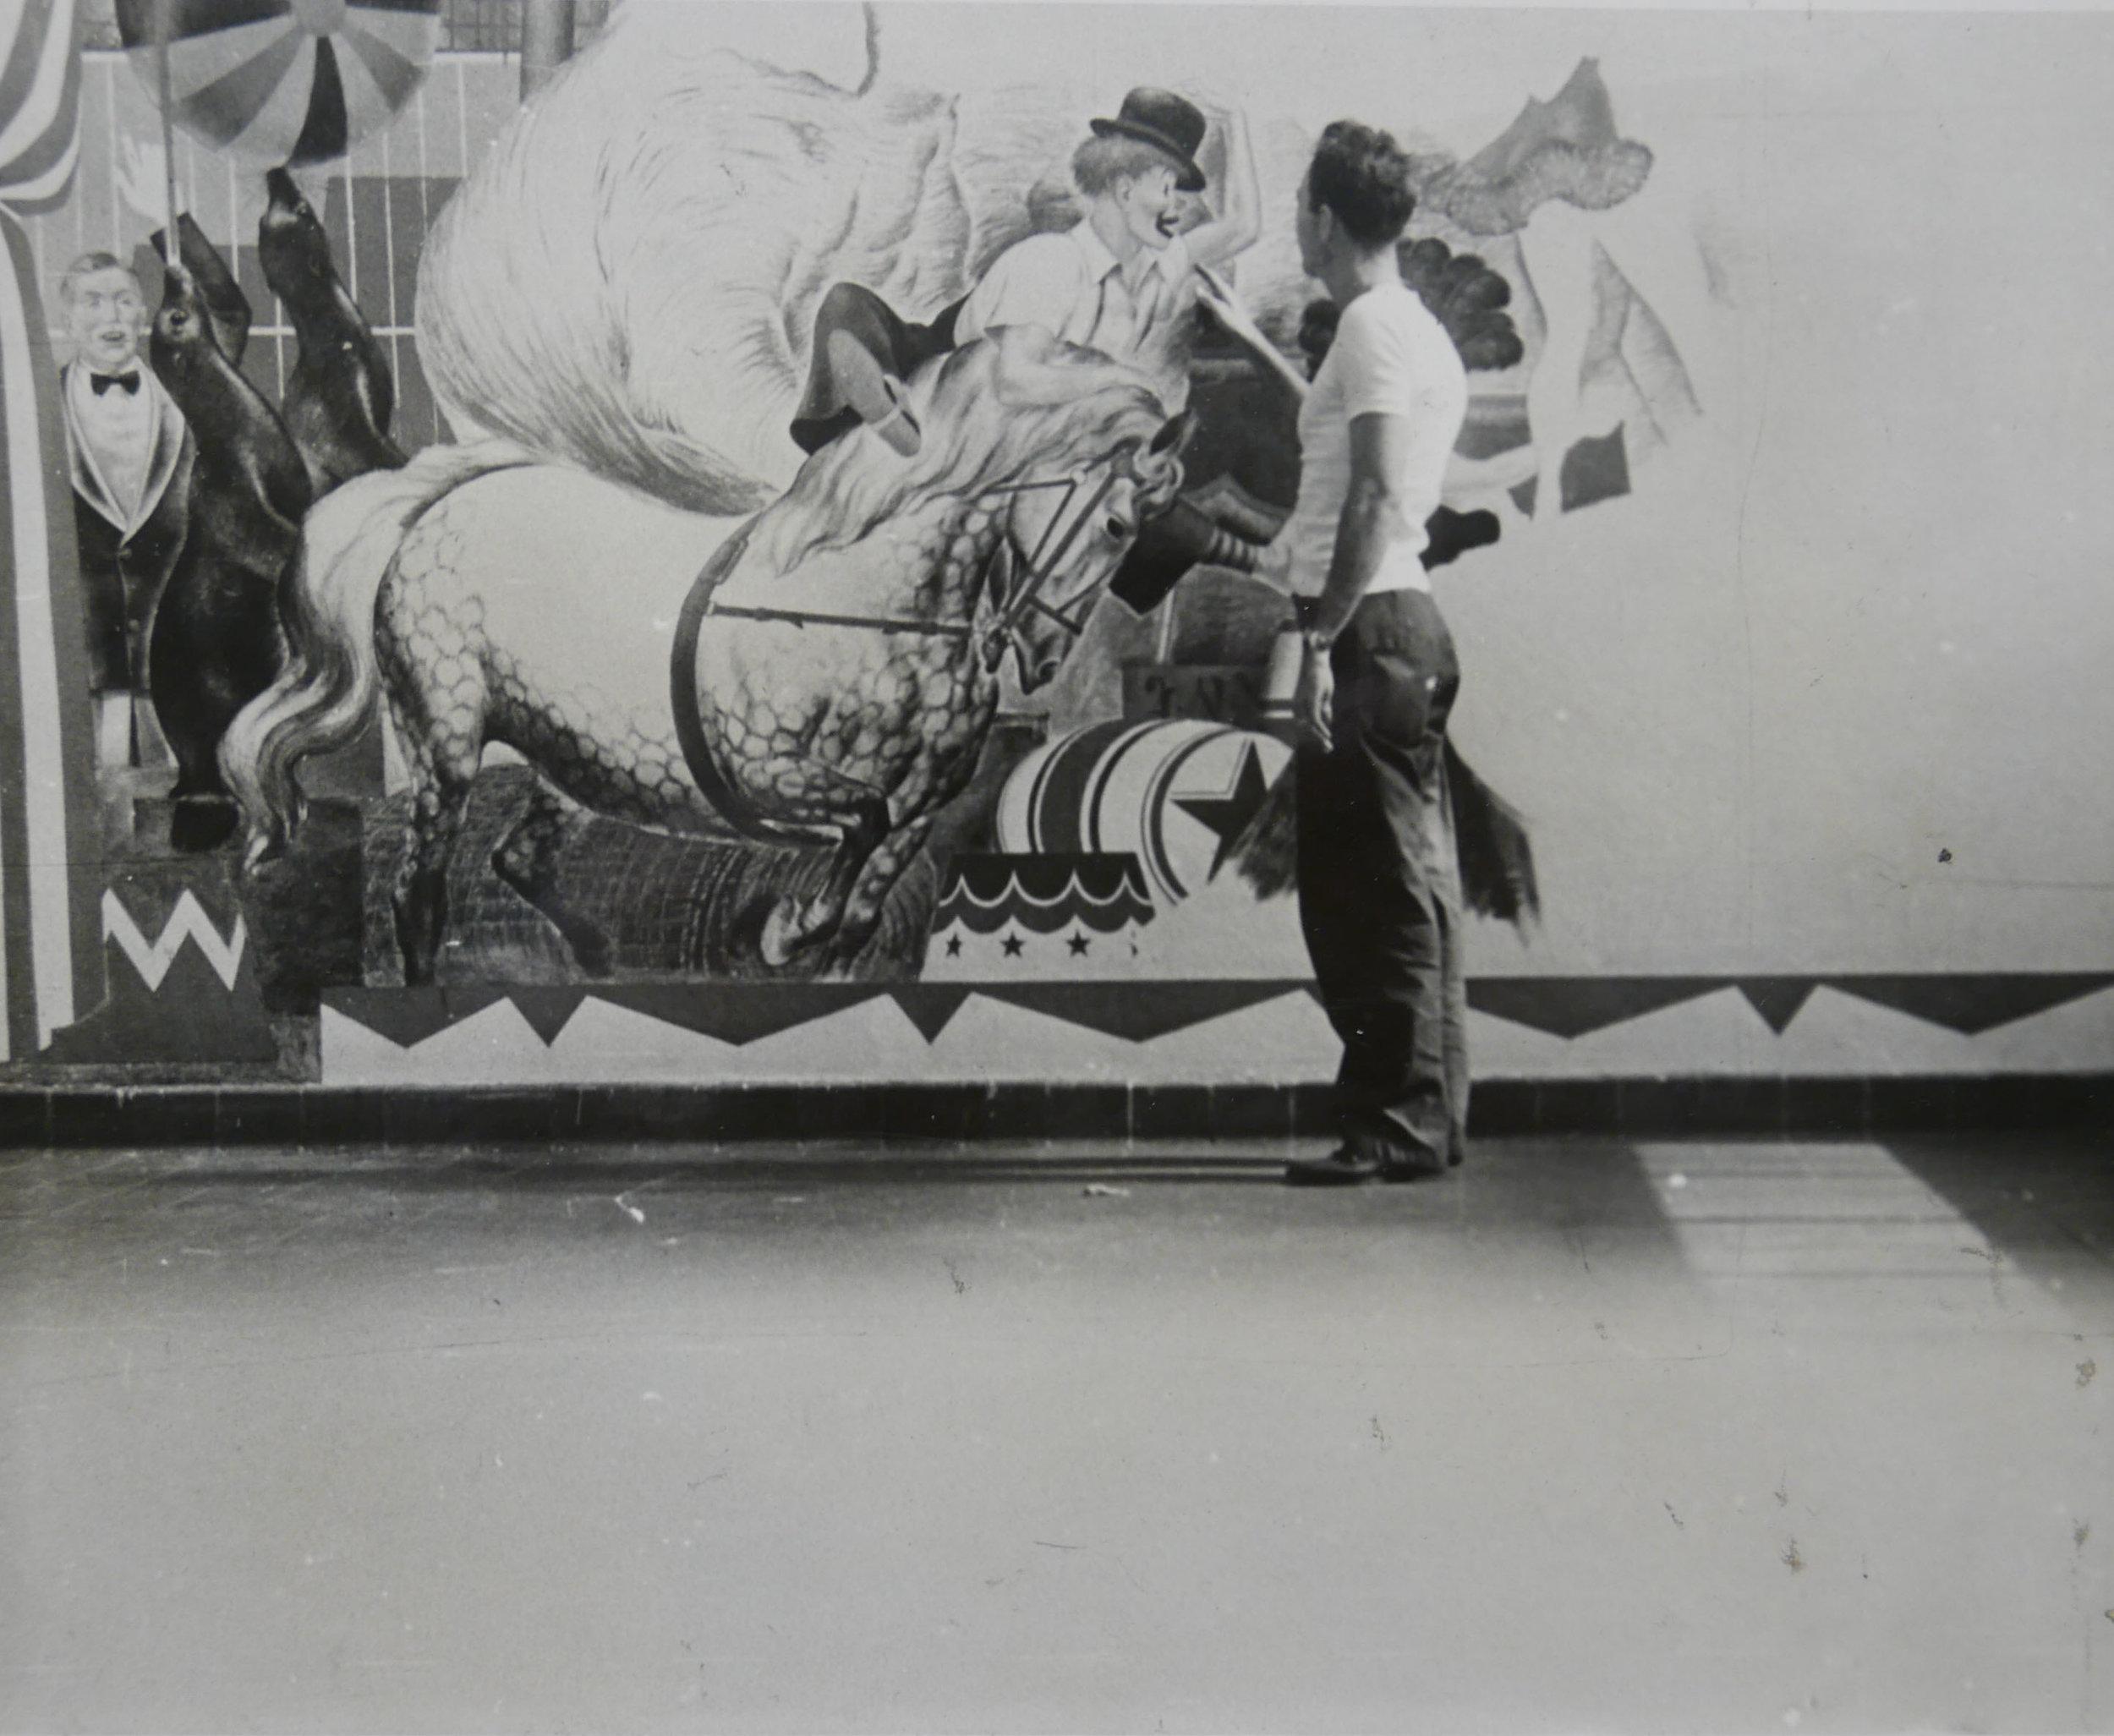 - REW working on the Methodist mural.